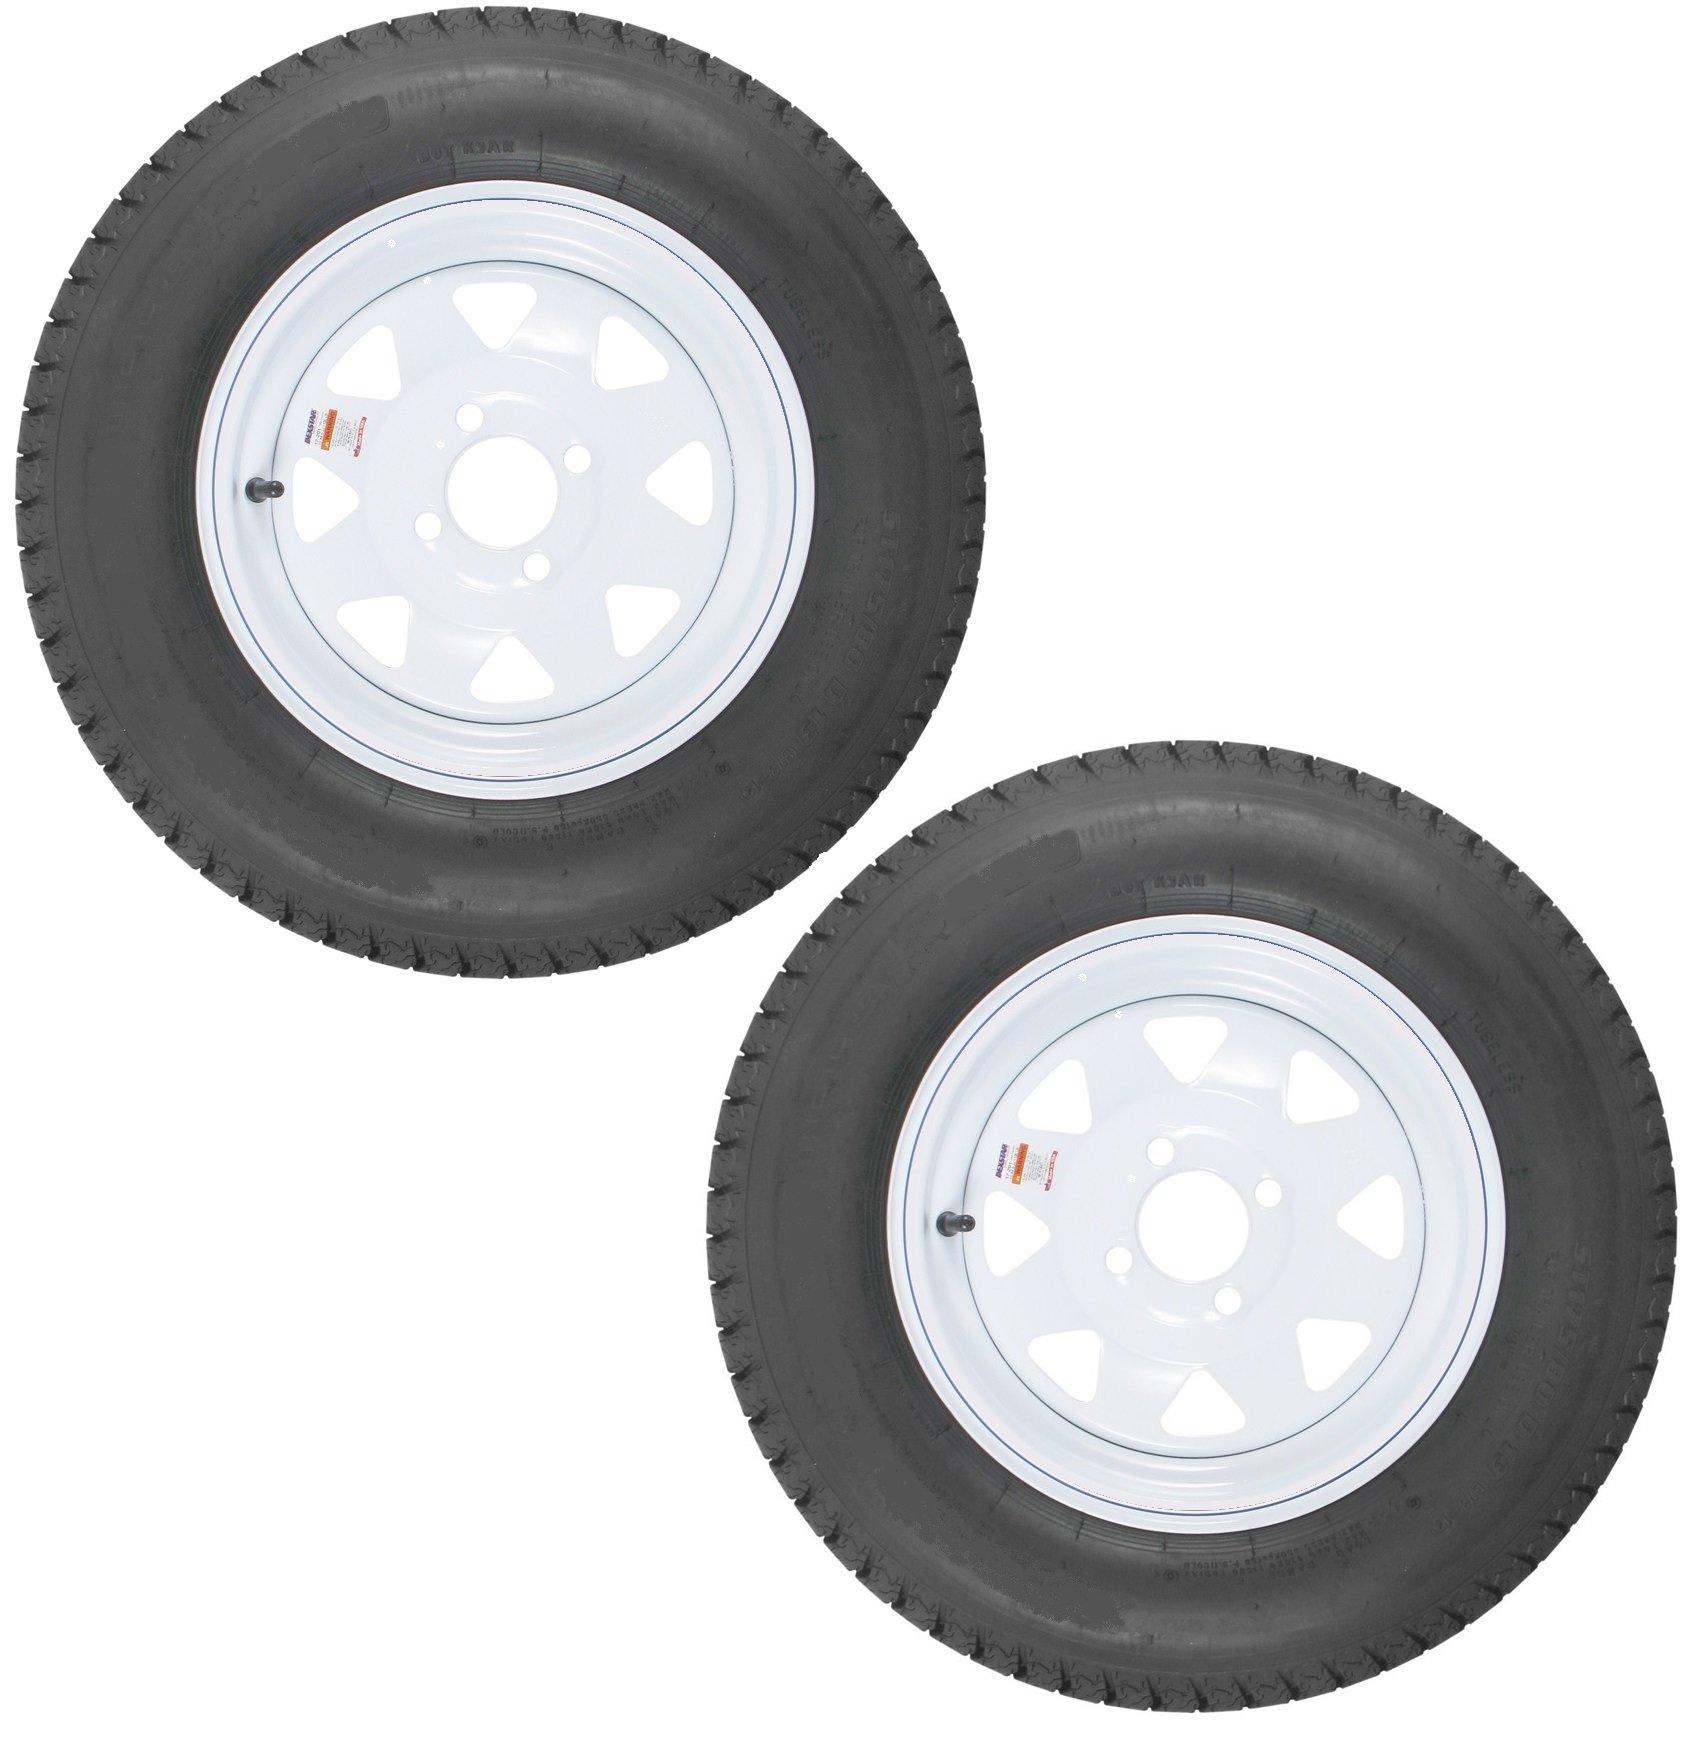 2-Pk eCustomrim Trailer Tire Rim ST175/80D13 13'' Load C 4 Lug White Spoke 39356